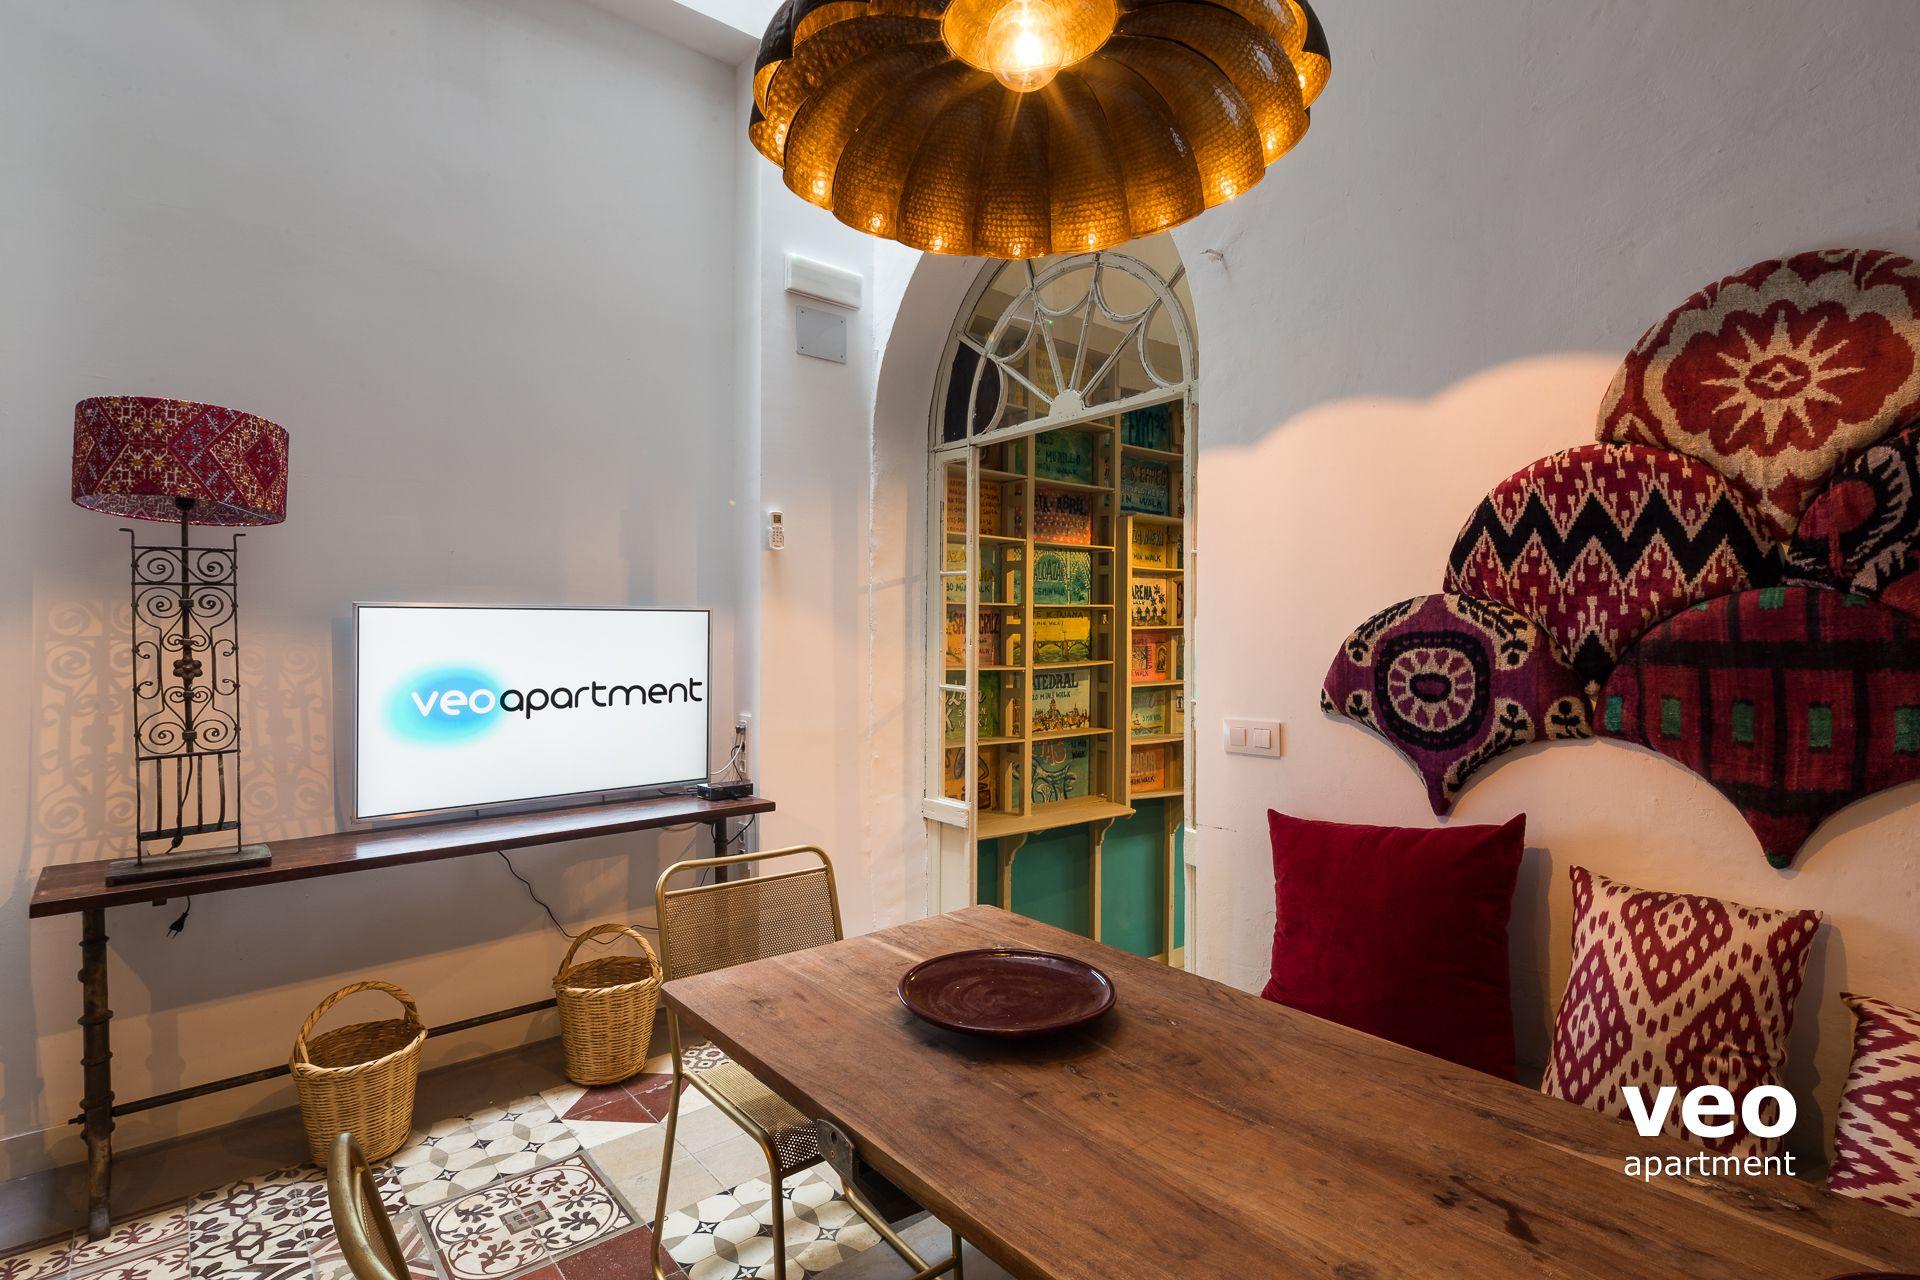 Sevilla apartmento calle alfonso xii sevilla espa a for Registro bienes muebles sevilla